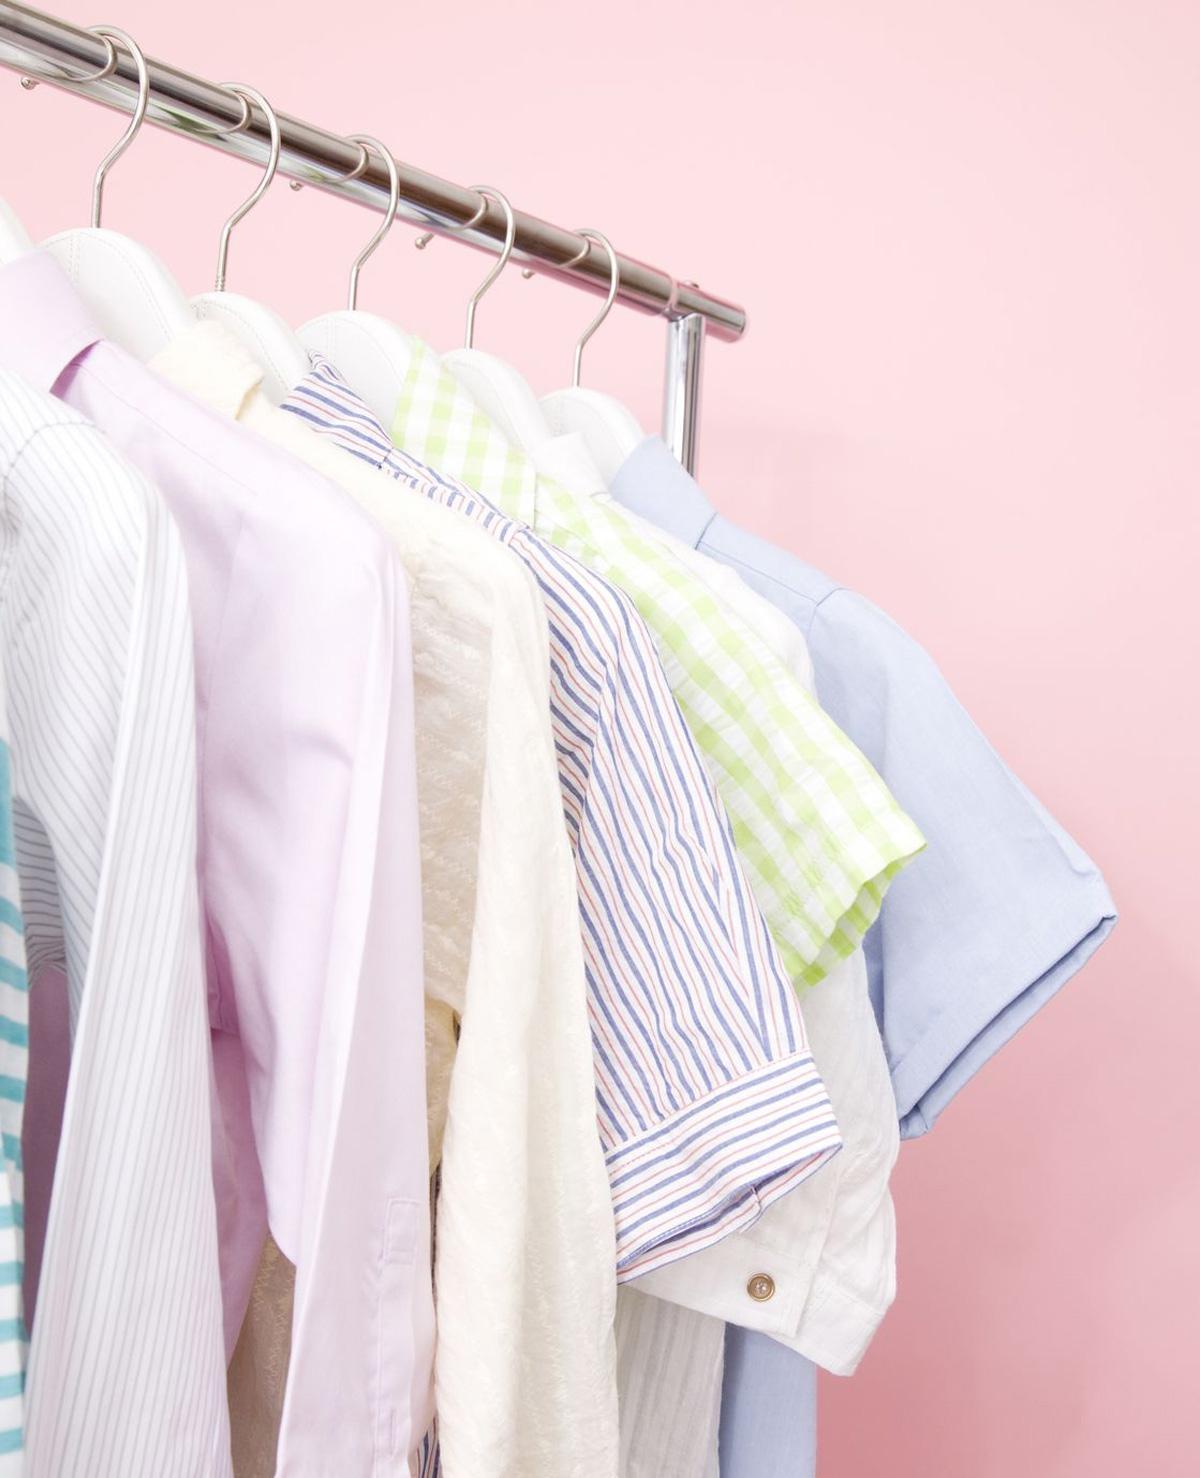 Hoe komen die kleine gaatjes in je T-shirt?